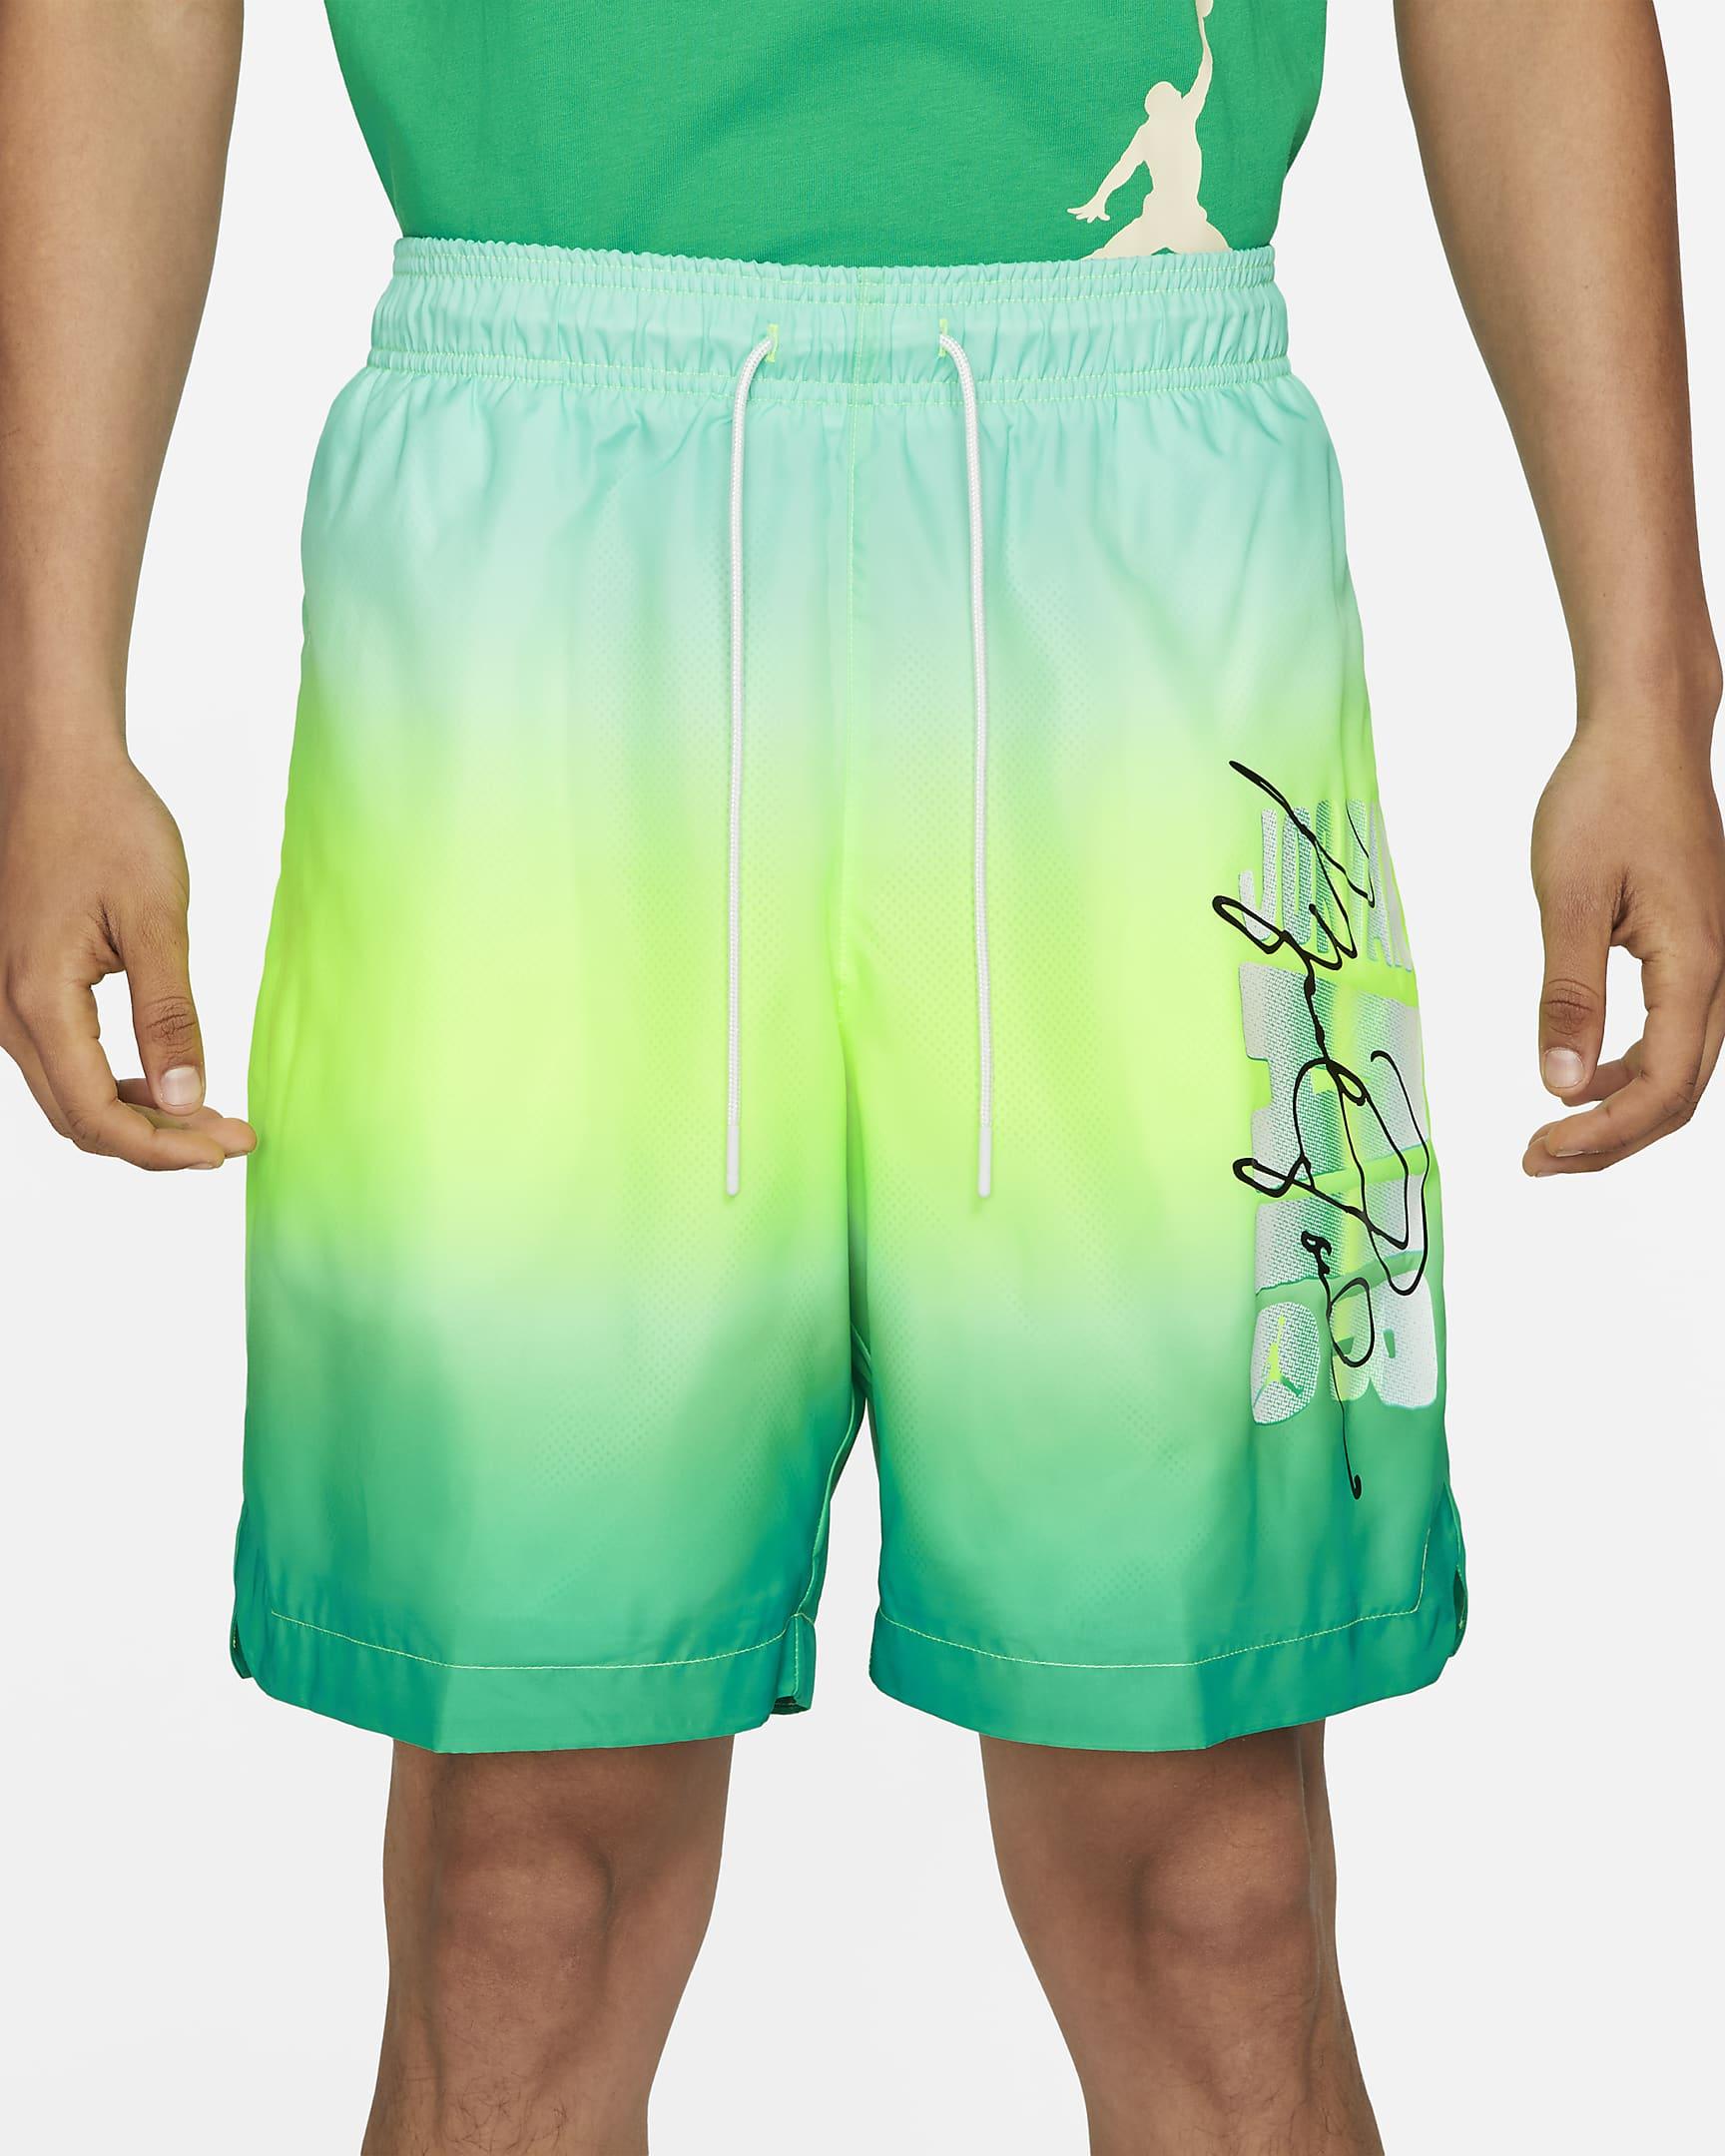 jordan-sport-dna-mens-pool-shorts-MklHwc.png